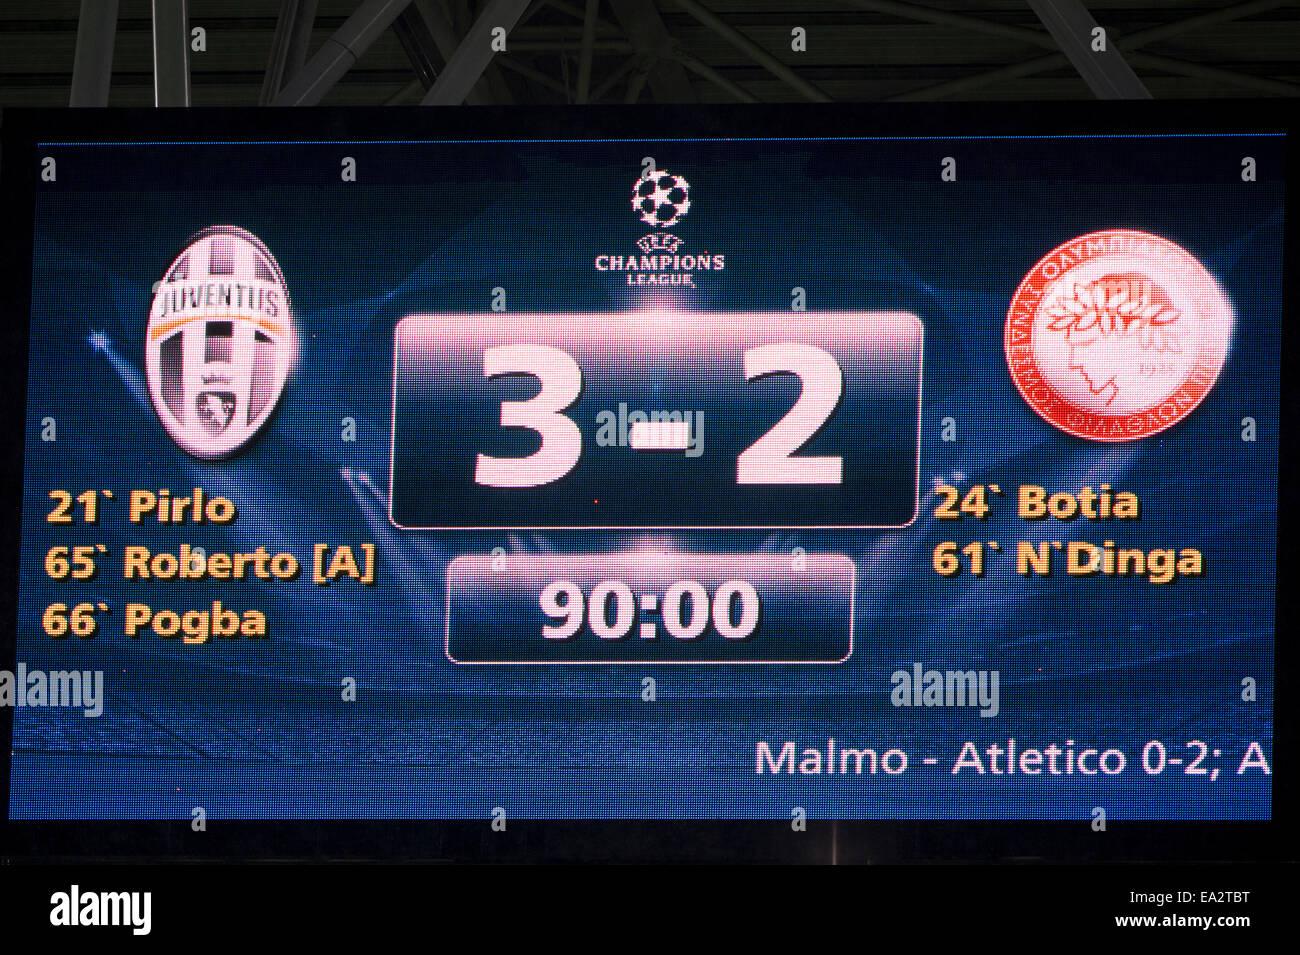 football score - photo #3